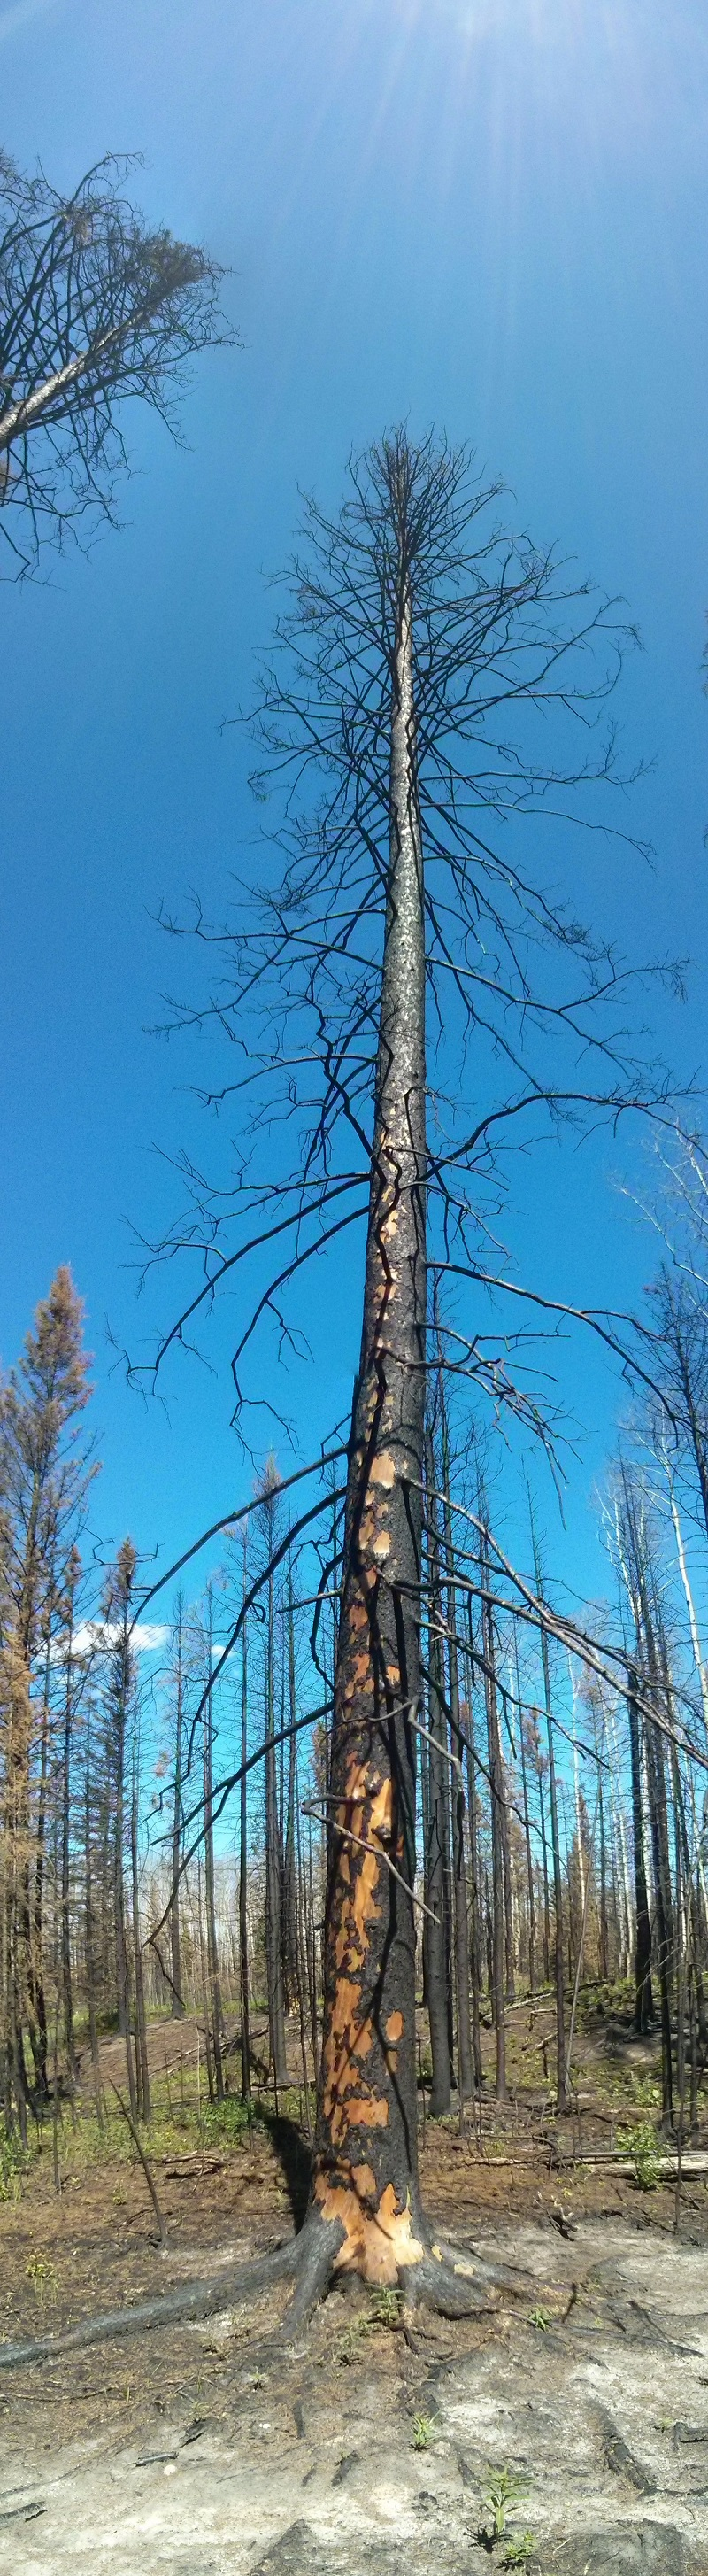 burnedspruce